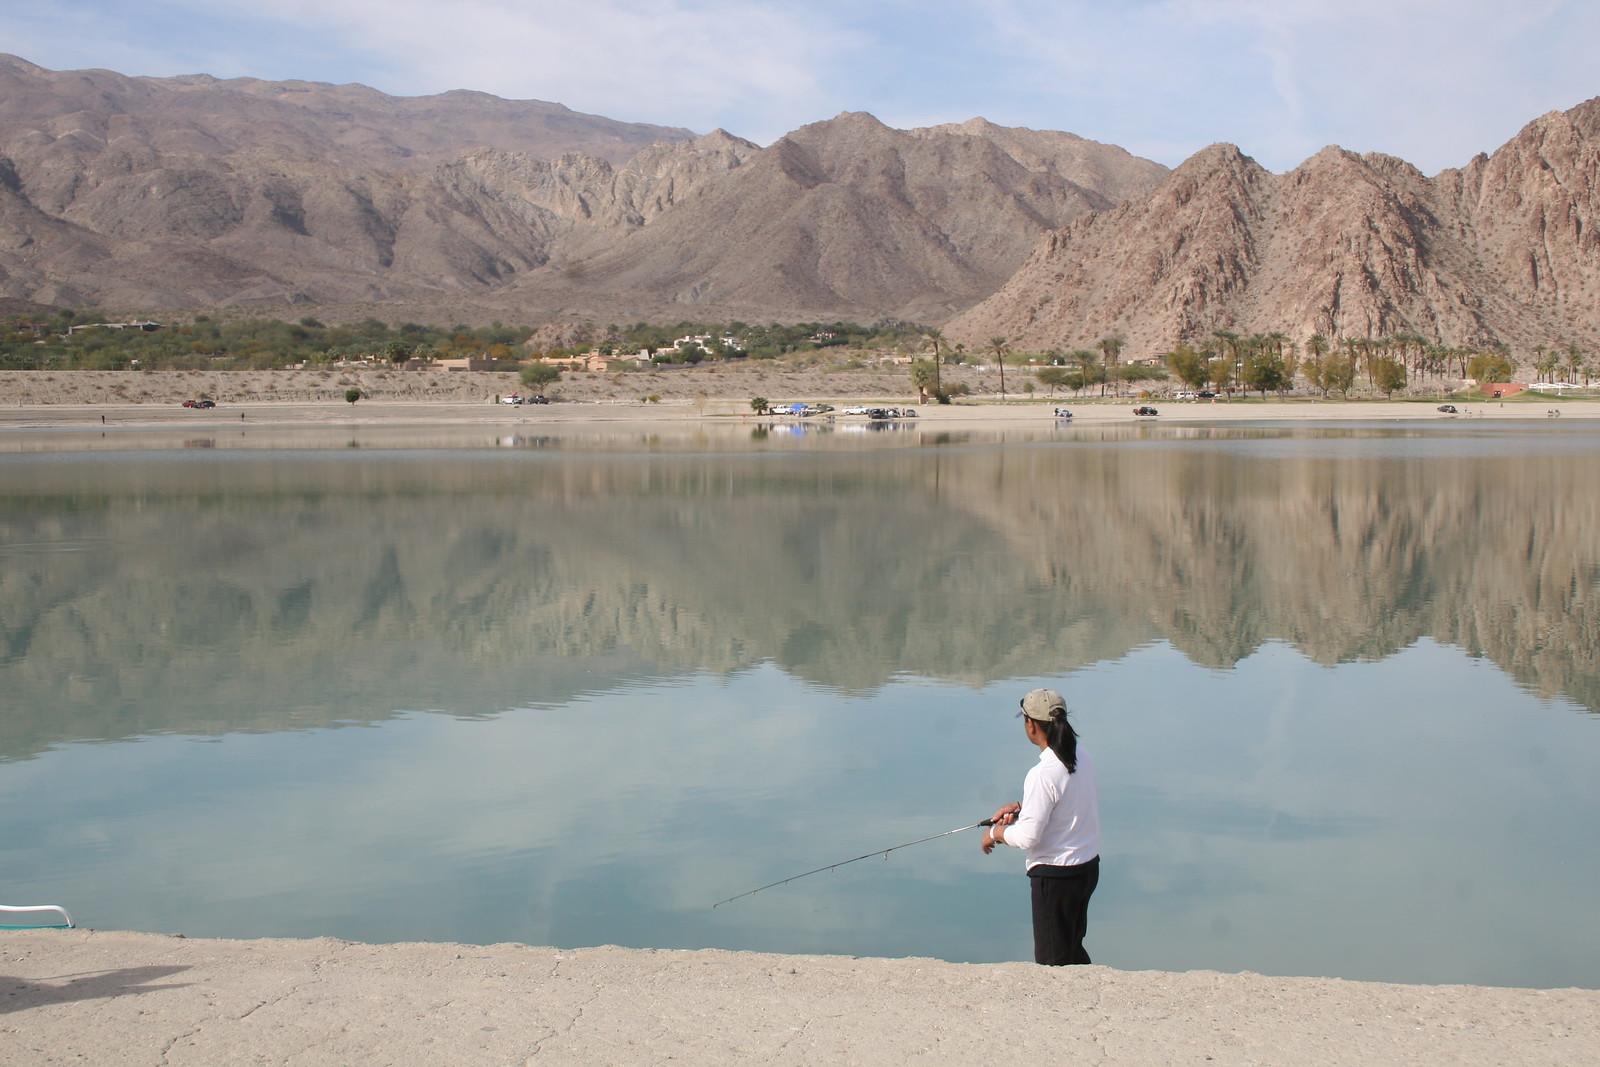 Fishing Lake Cahuilla